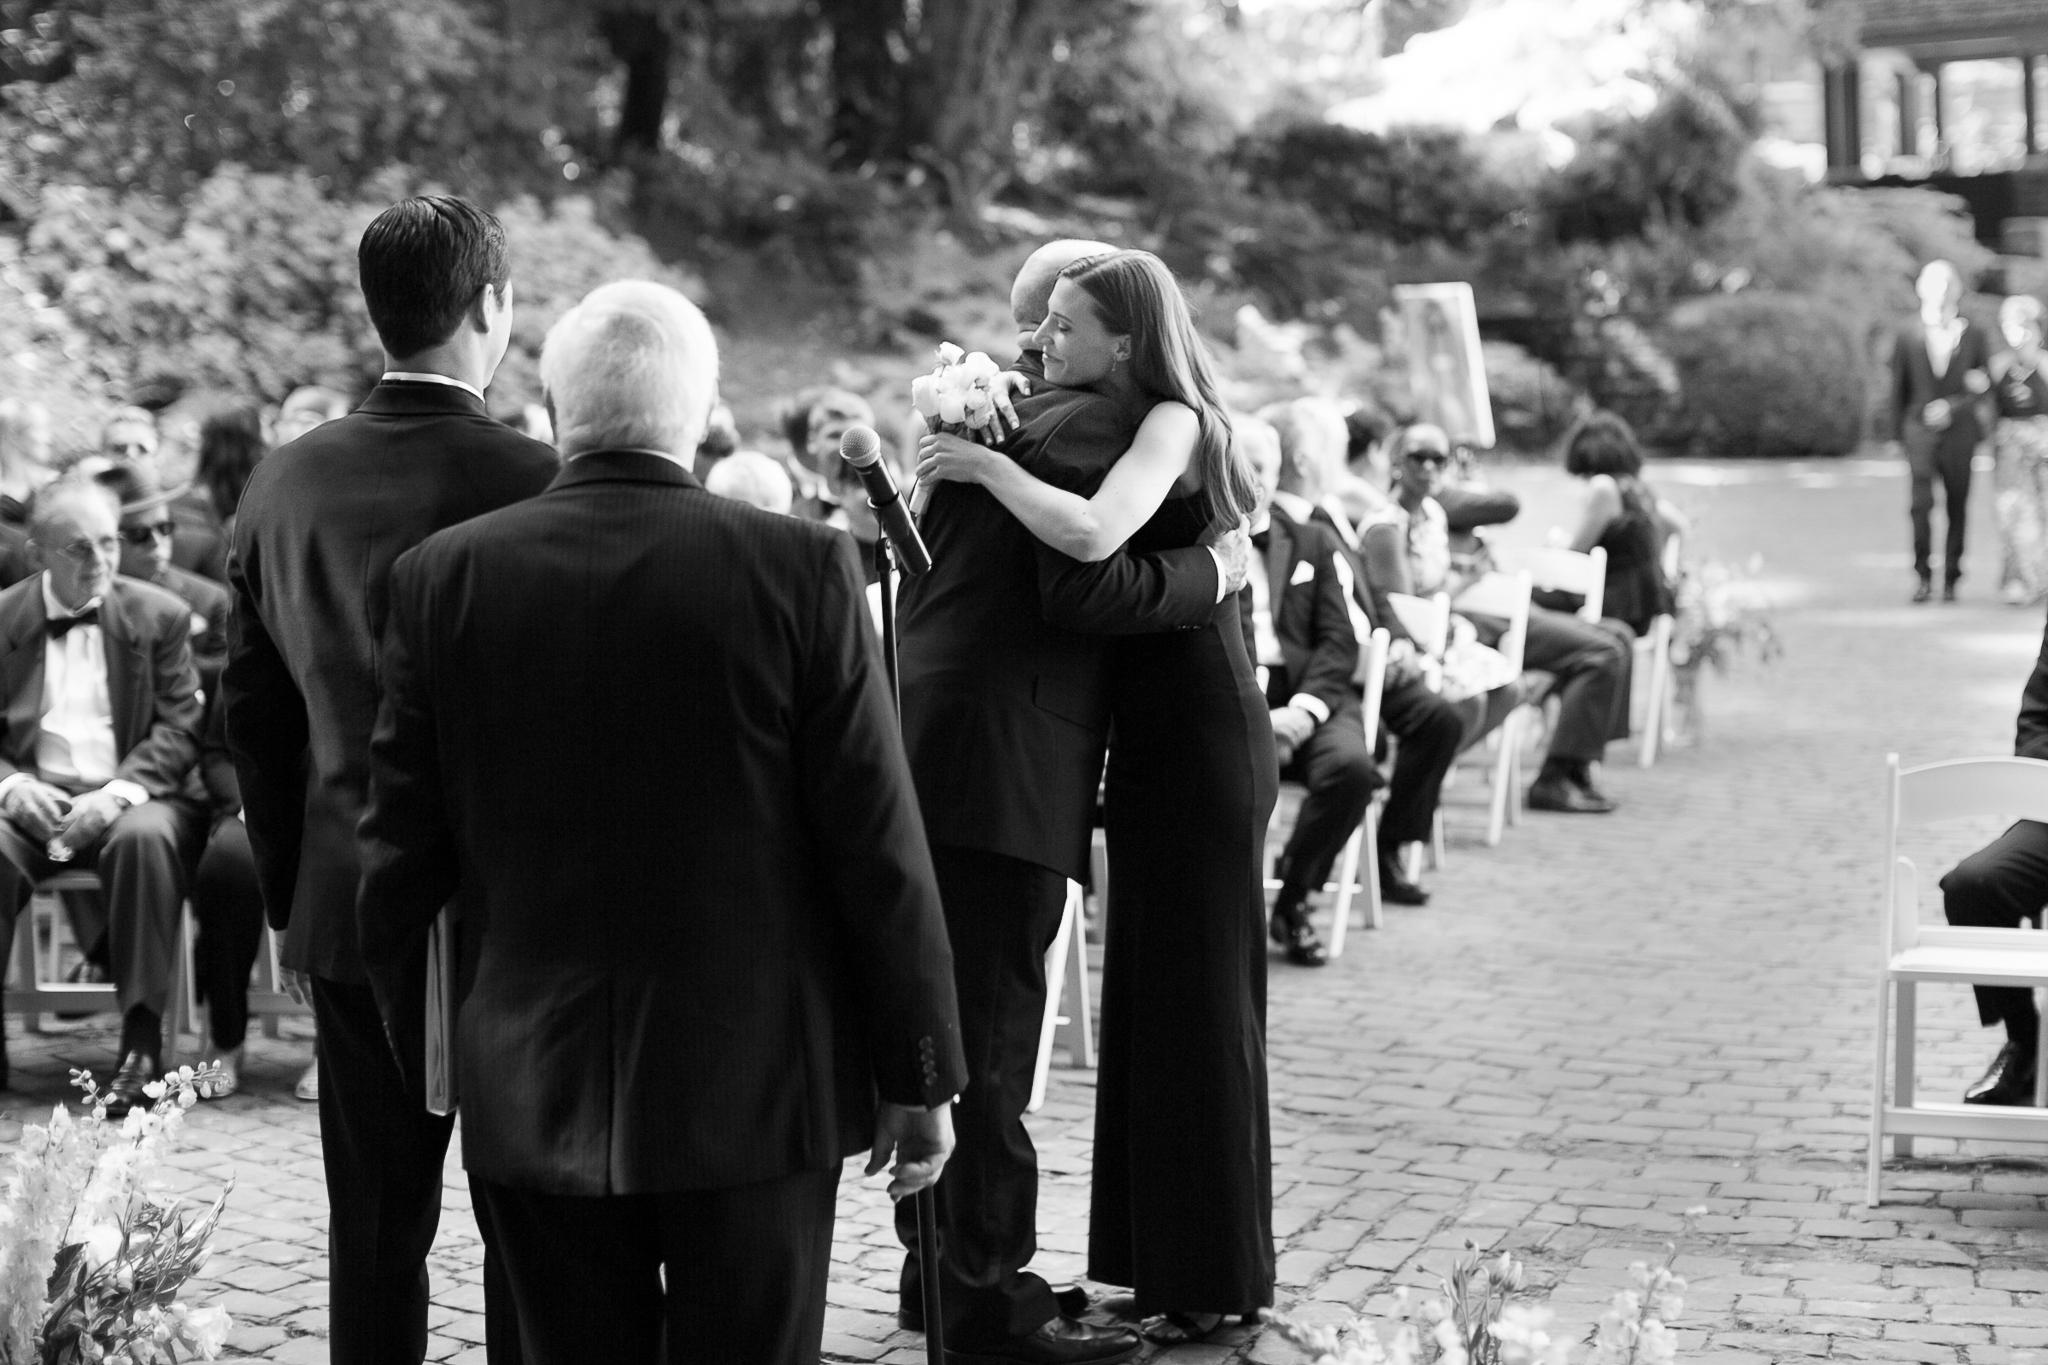 126OutliveCreative_Travel_Photographer_Videographer_Lewis&Clark_Oregon_Elegant_BlackTie_Destination_Wedding.jpg